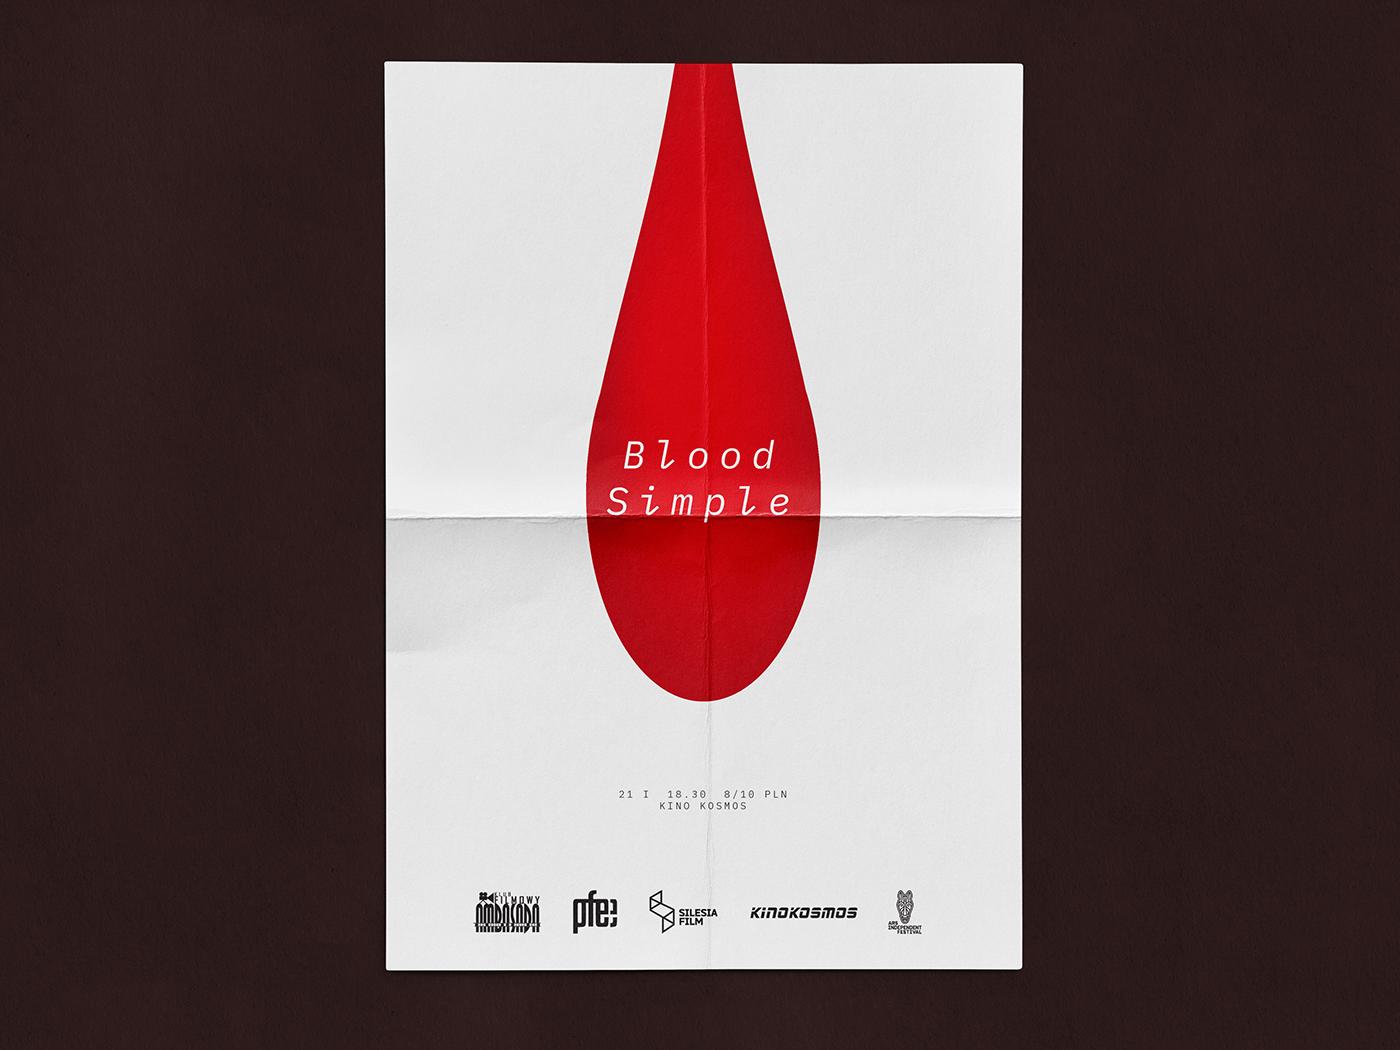 Cinema Film   films graphic minimalistic movie Movies poster posters